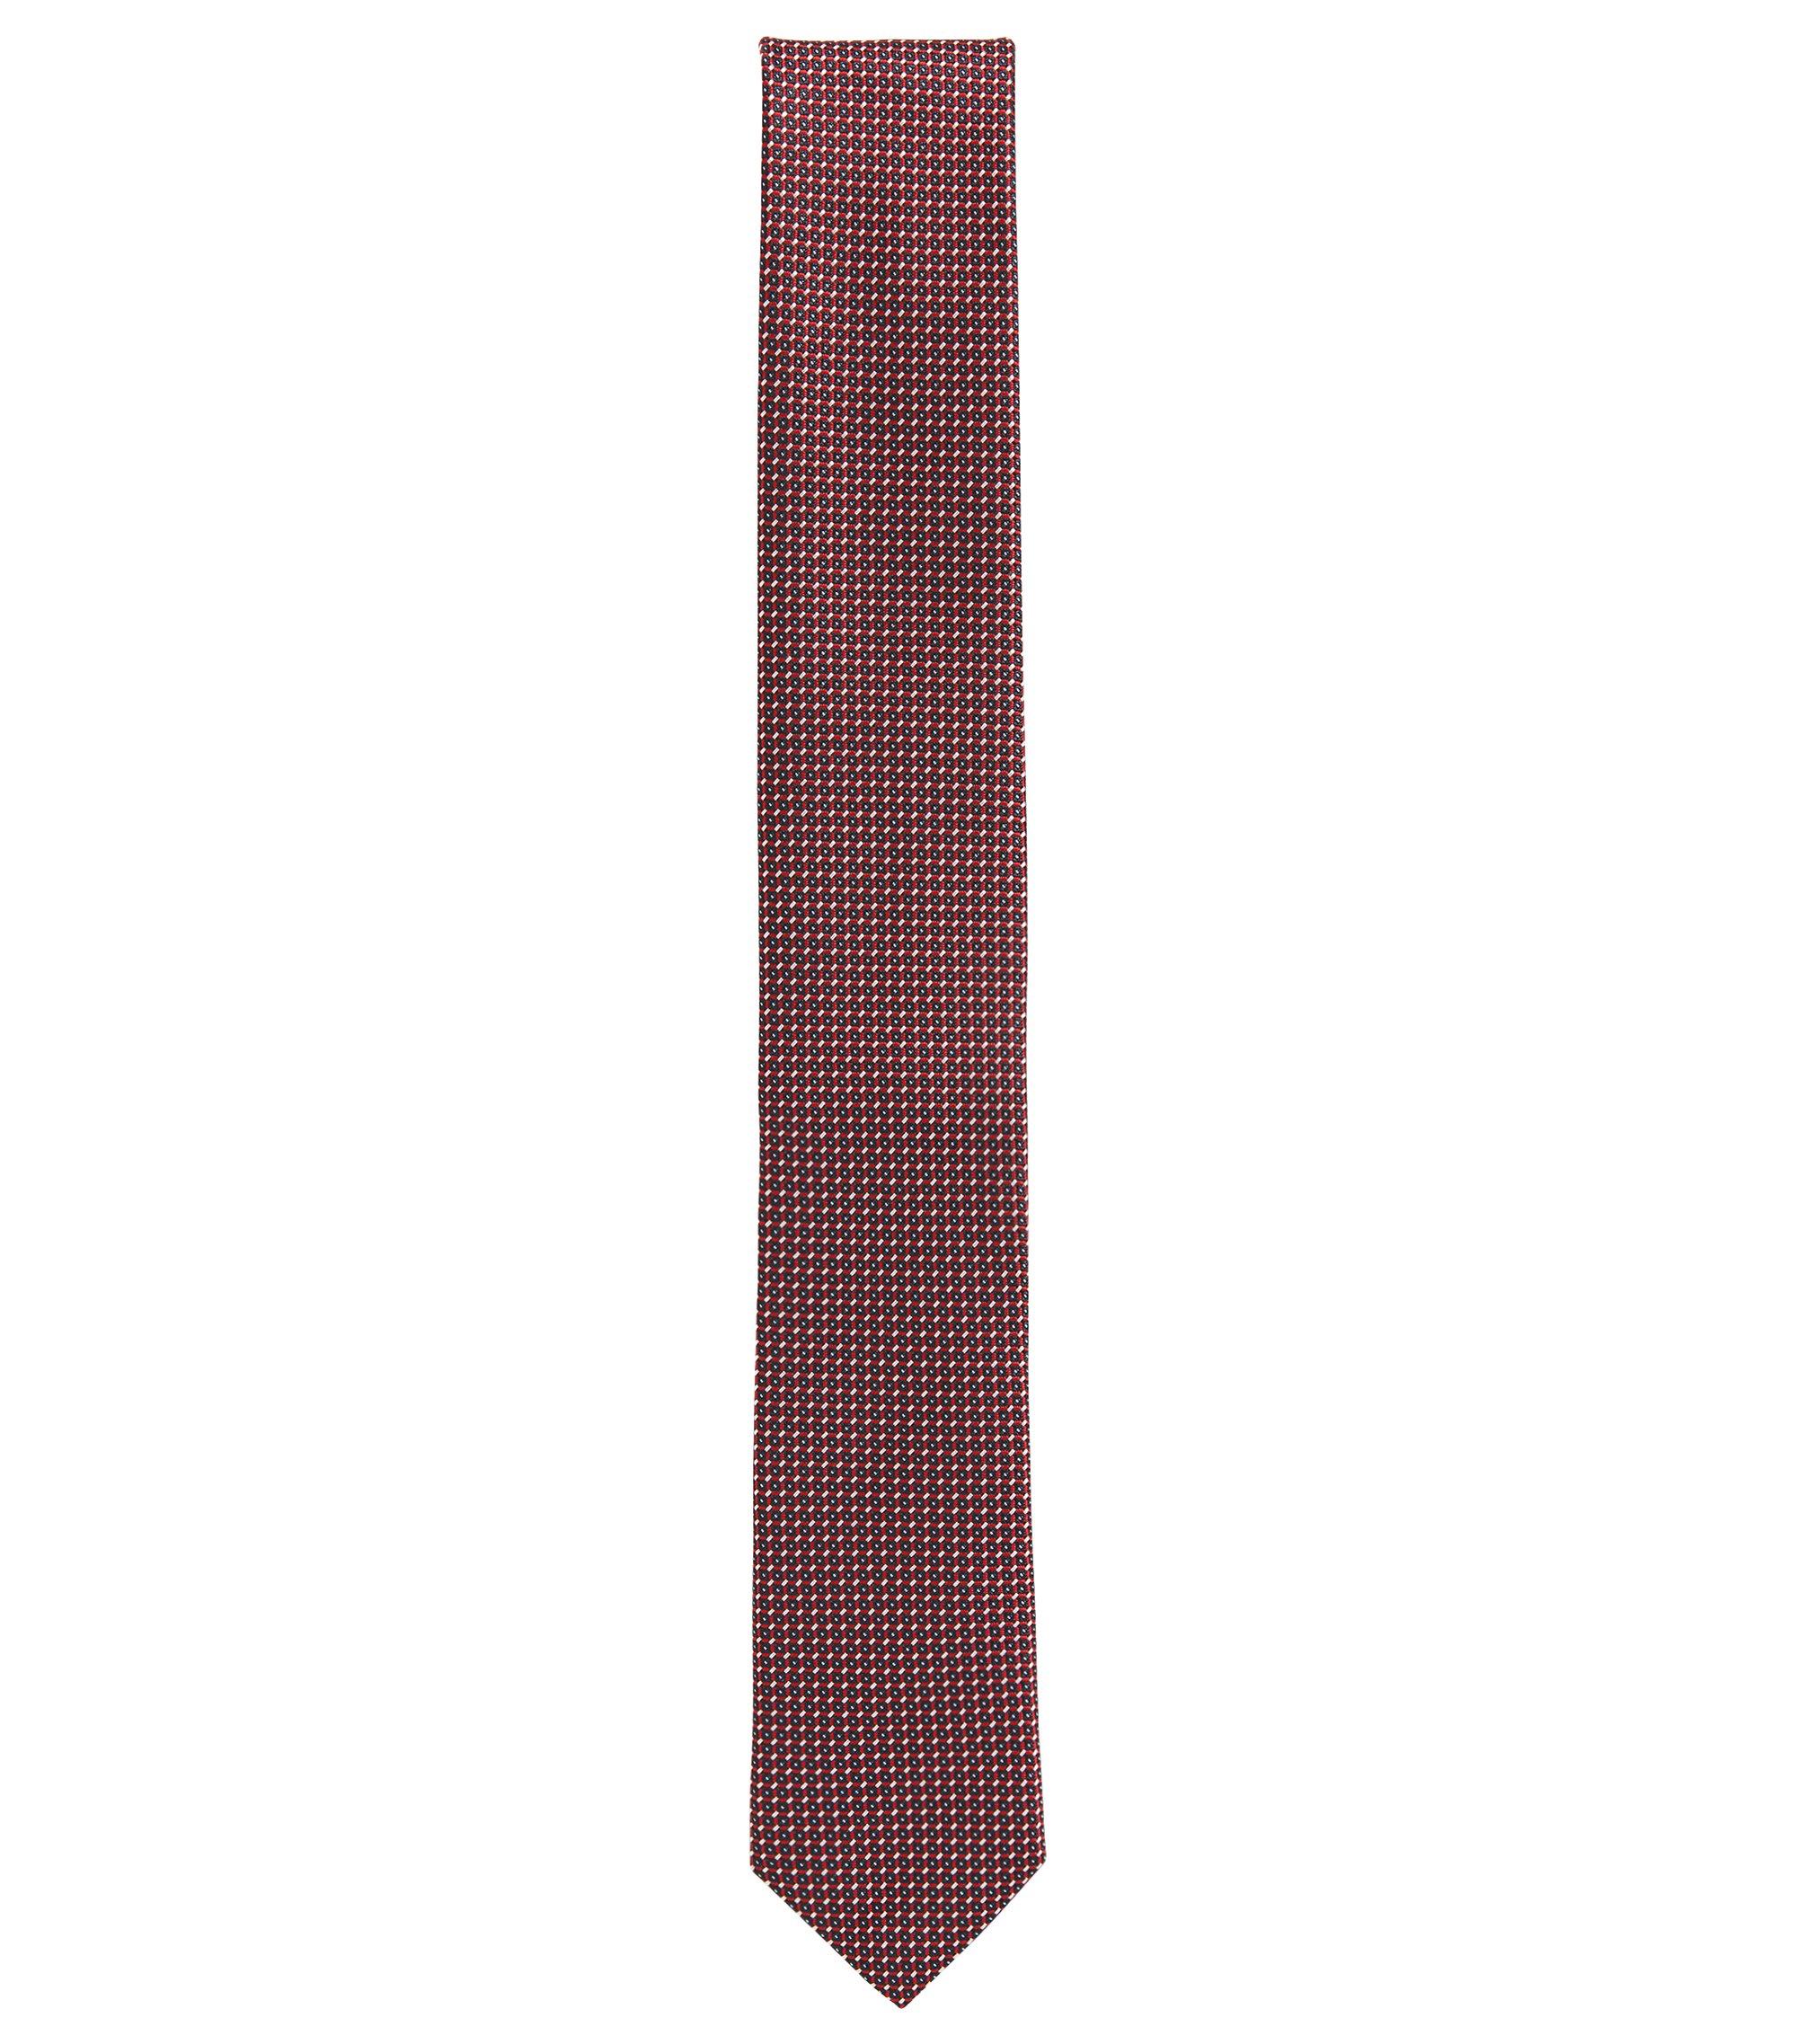 Corbata elaborada en Italia con jacquard de seda, Rosa oscuro